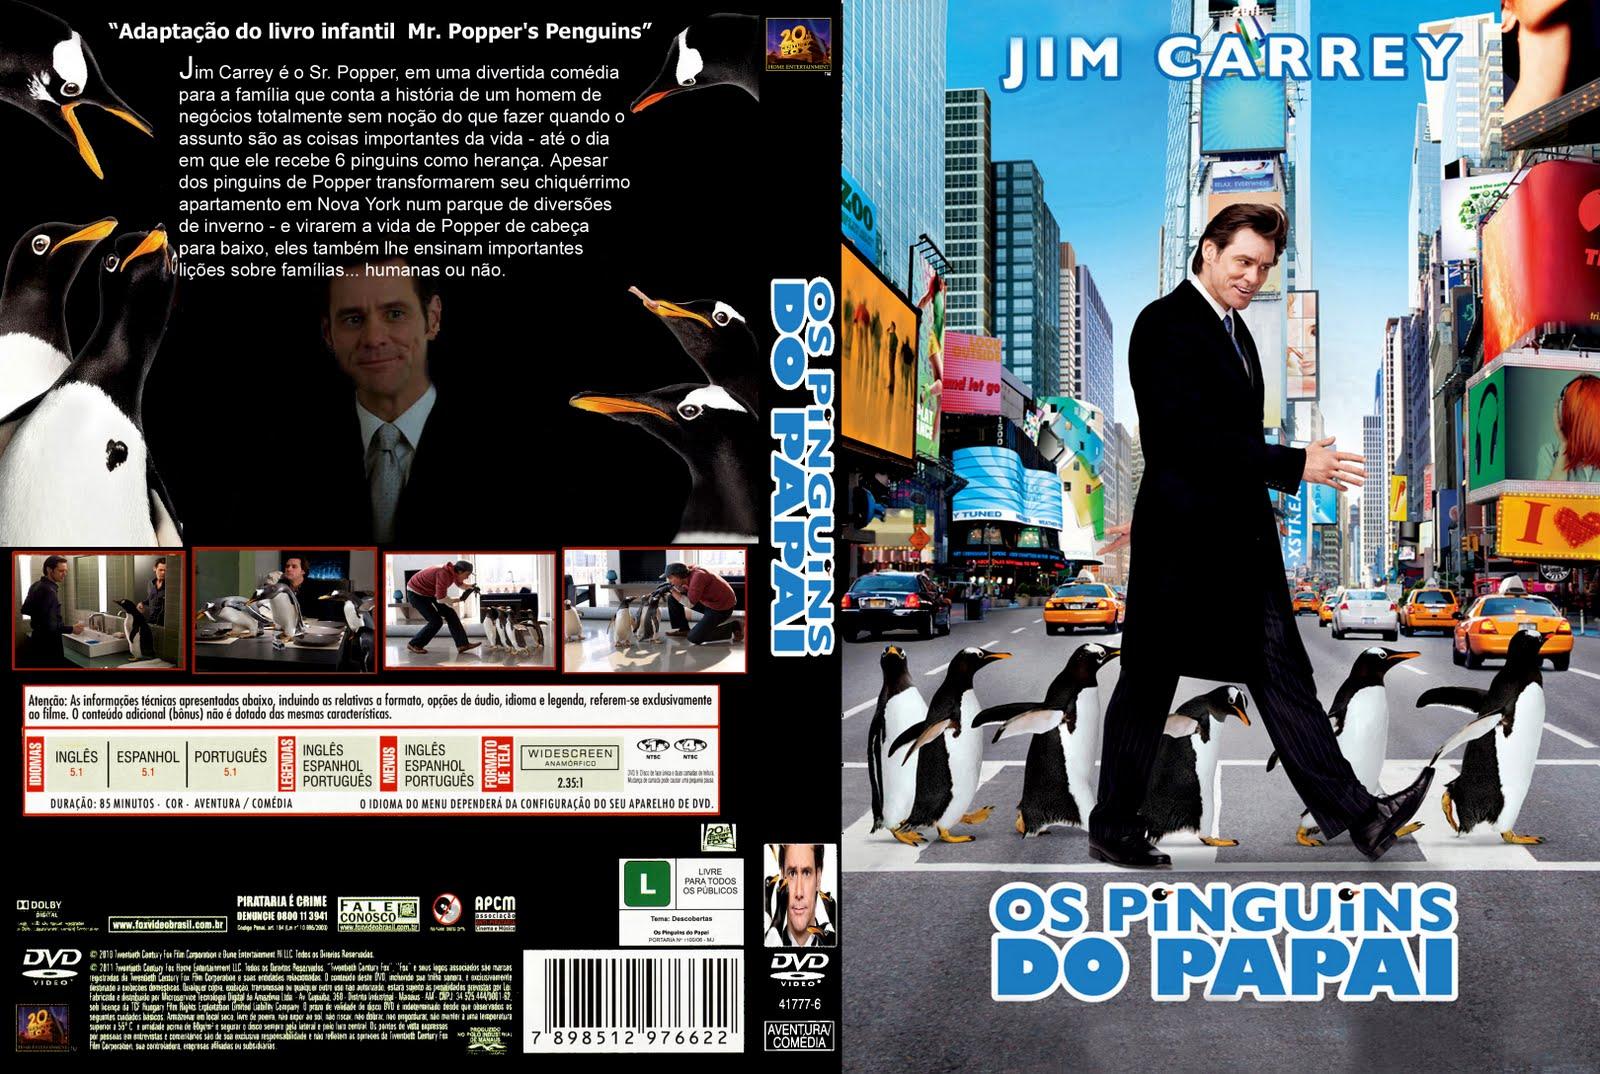 http://4.bp.blogspot.com/-J7RXO6uEvVA/TqN_a44GJMI/AAAAAAAAAVc/6Ahv-R-NvDw/s1600/Os+Pinguins+Do+Papai.jpg